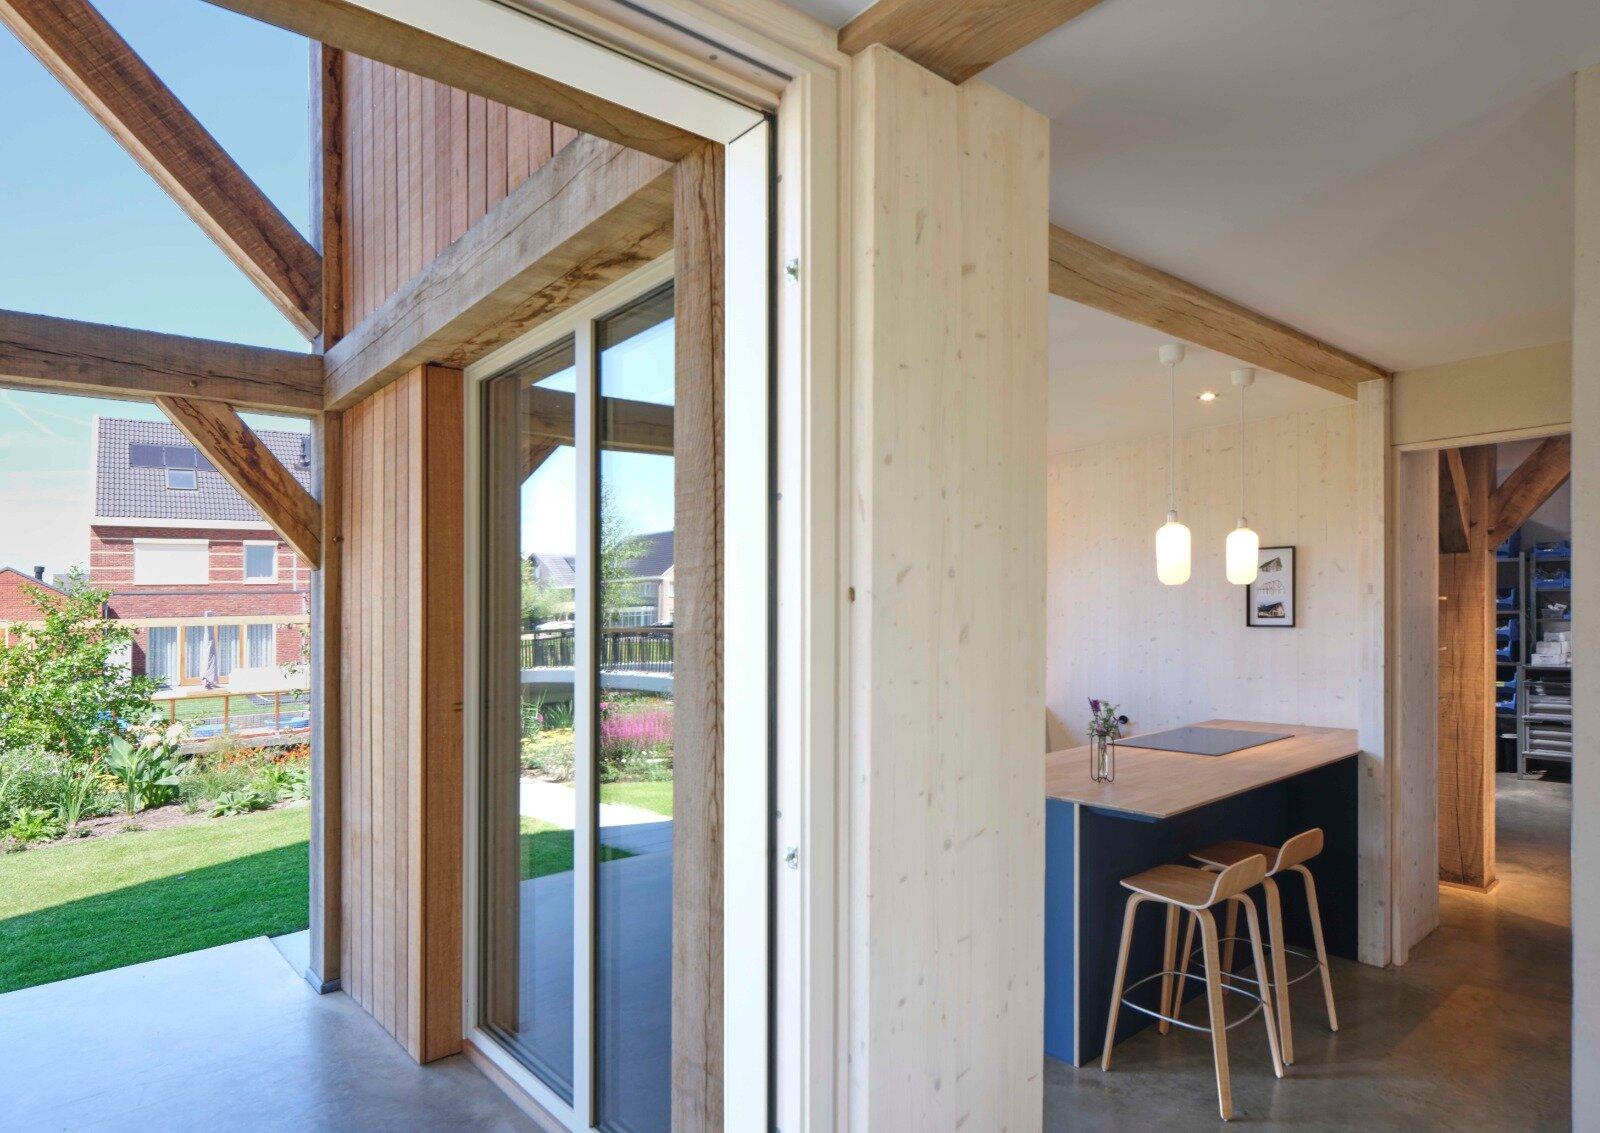 Eiken Houten Spanten Projecten Pagina Schoots Architecten Bna